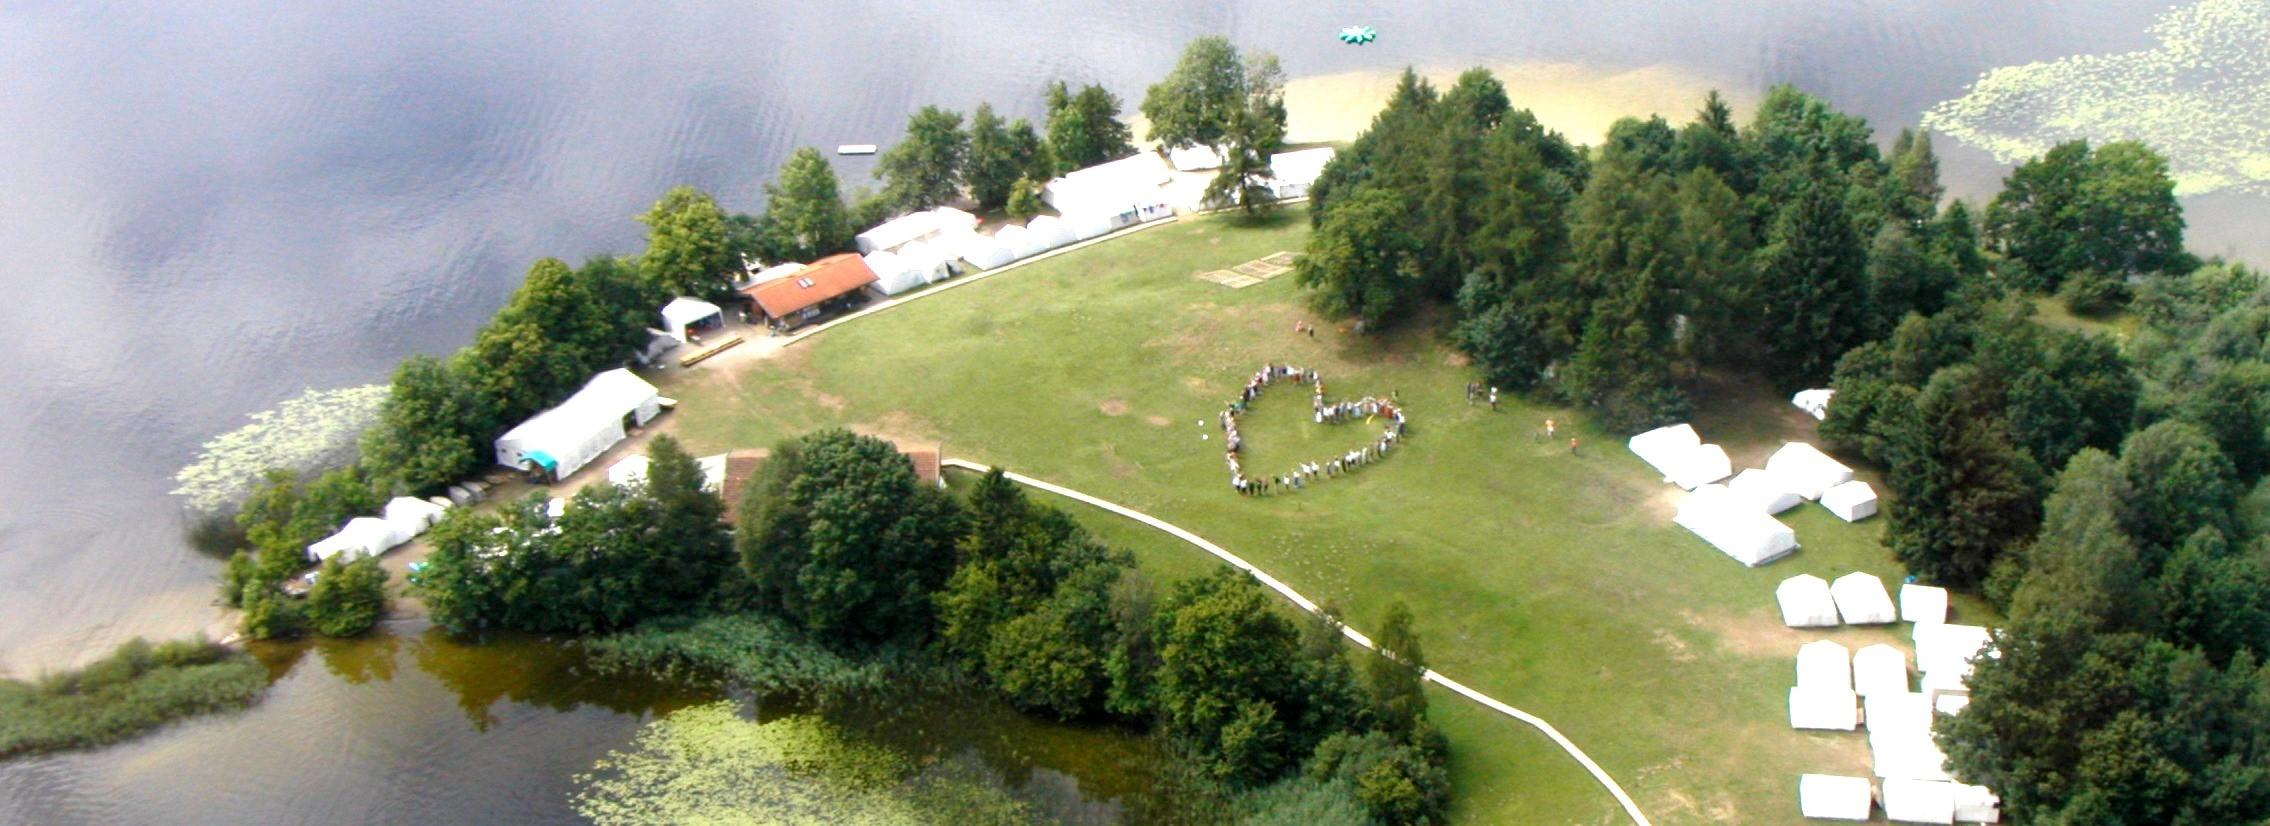 Zeltlager Wochenende am Staffelsee (LiBi)